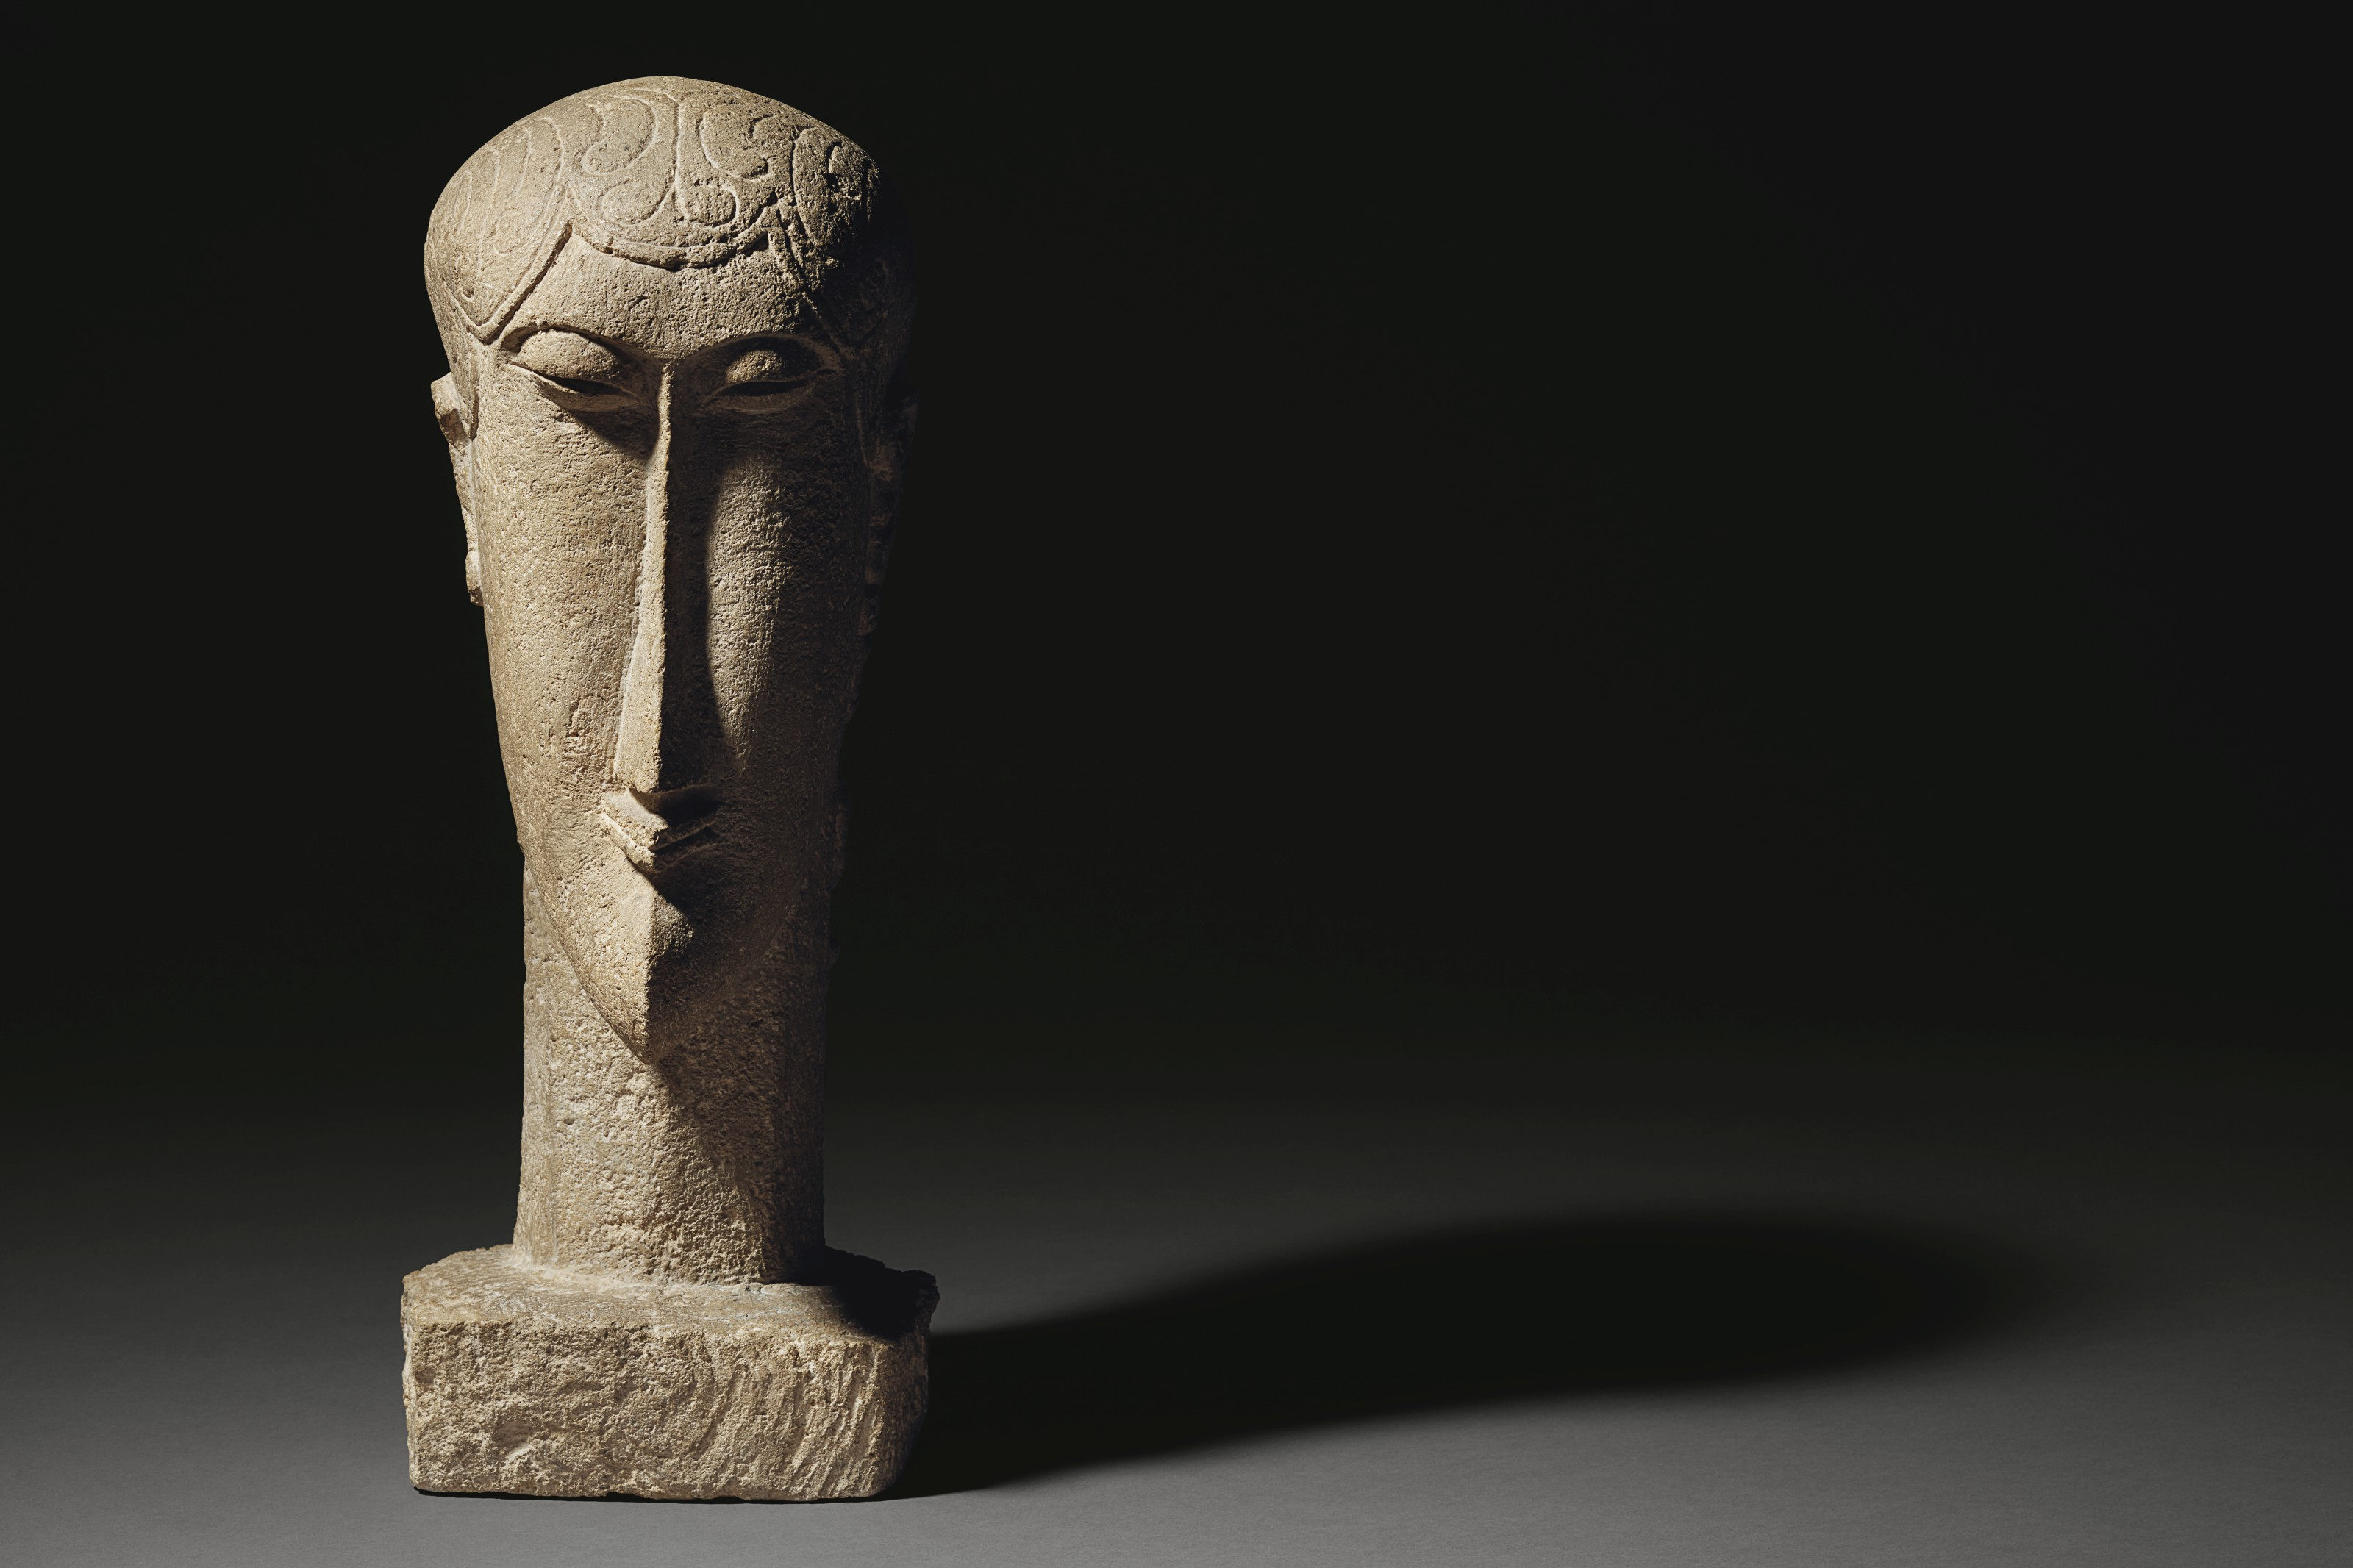 Amedeo Modigliani: Amedeo Modigliani (1884-1920) , Tête